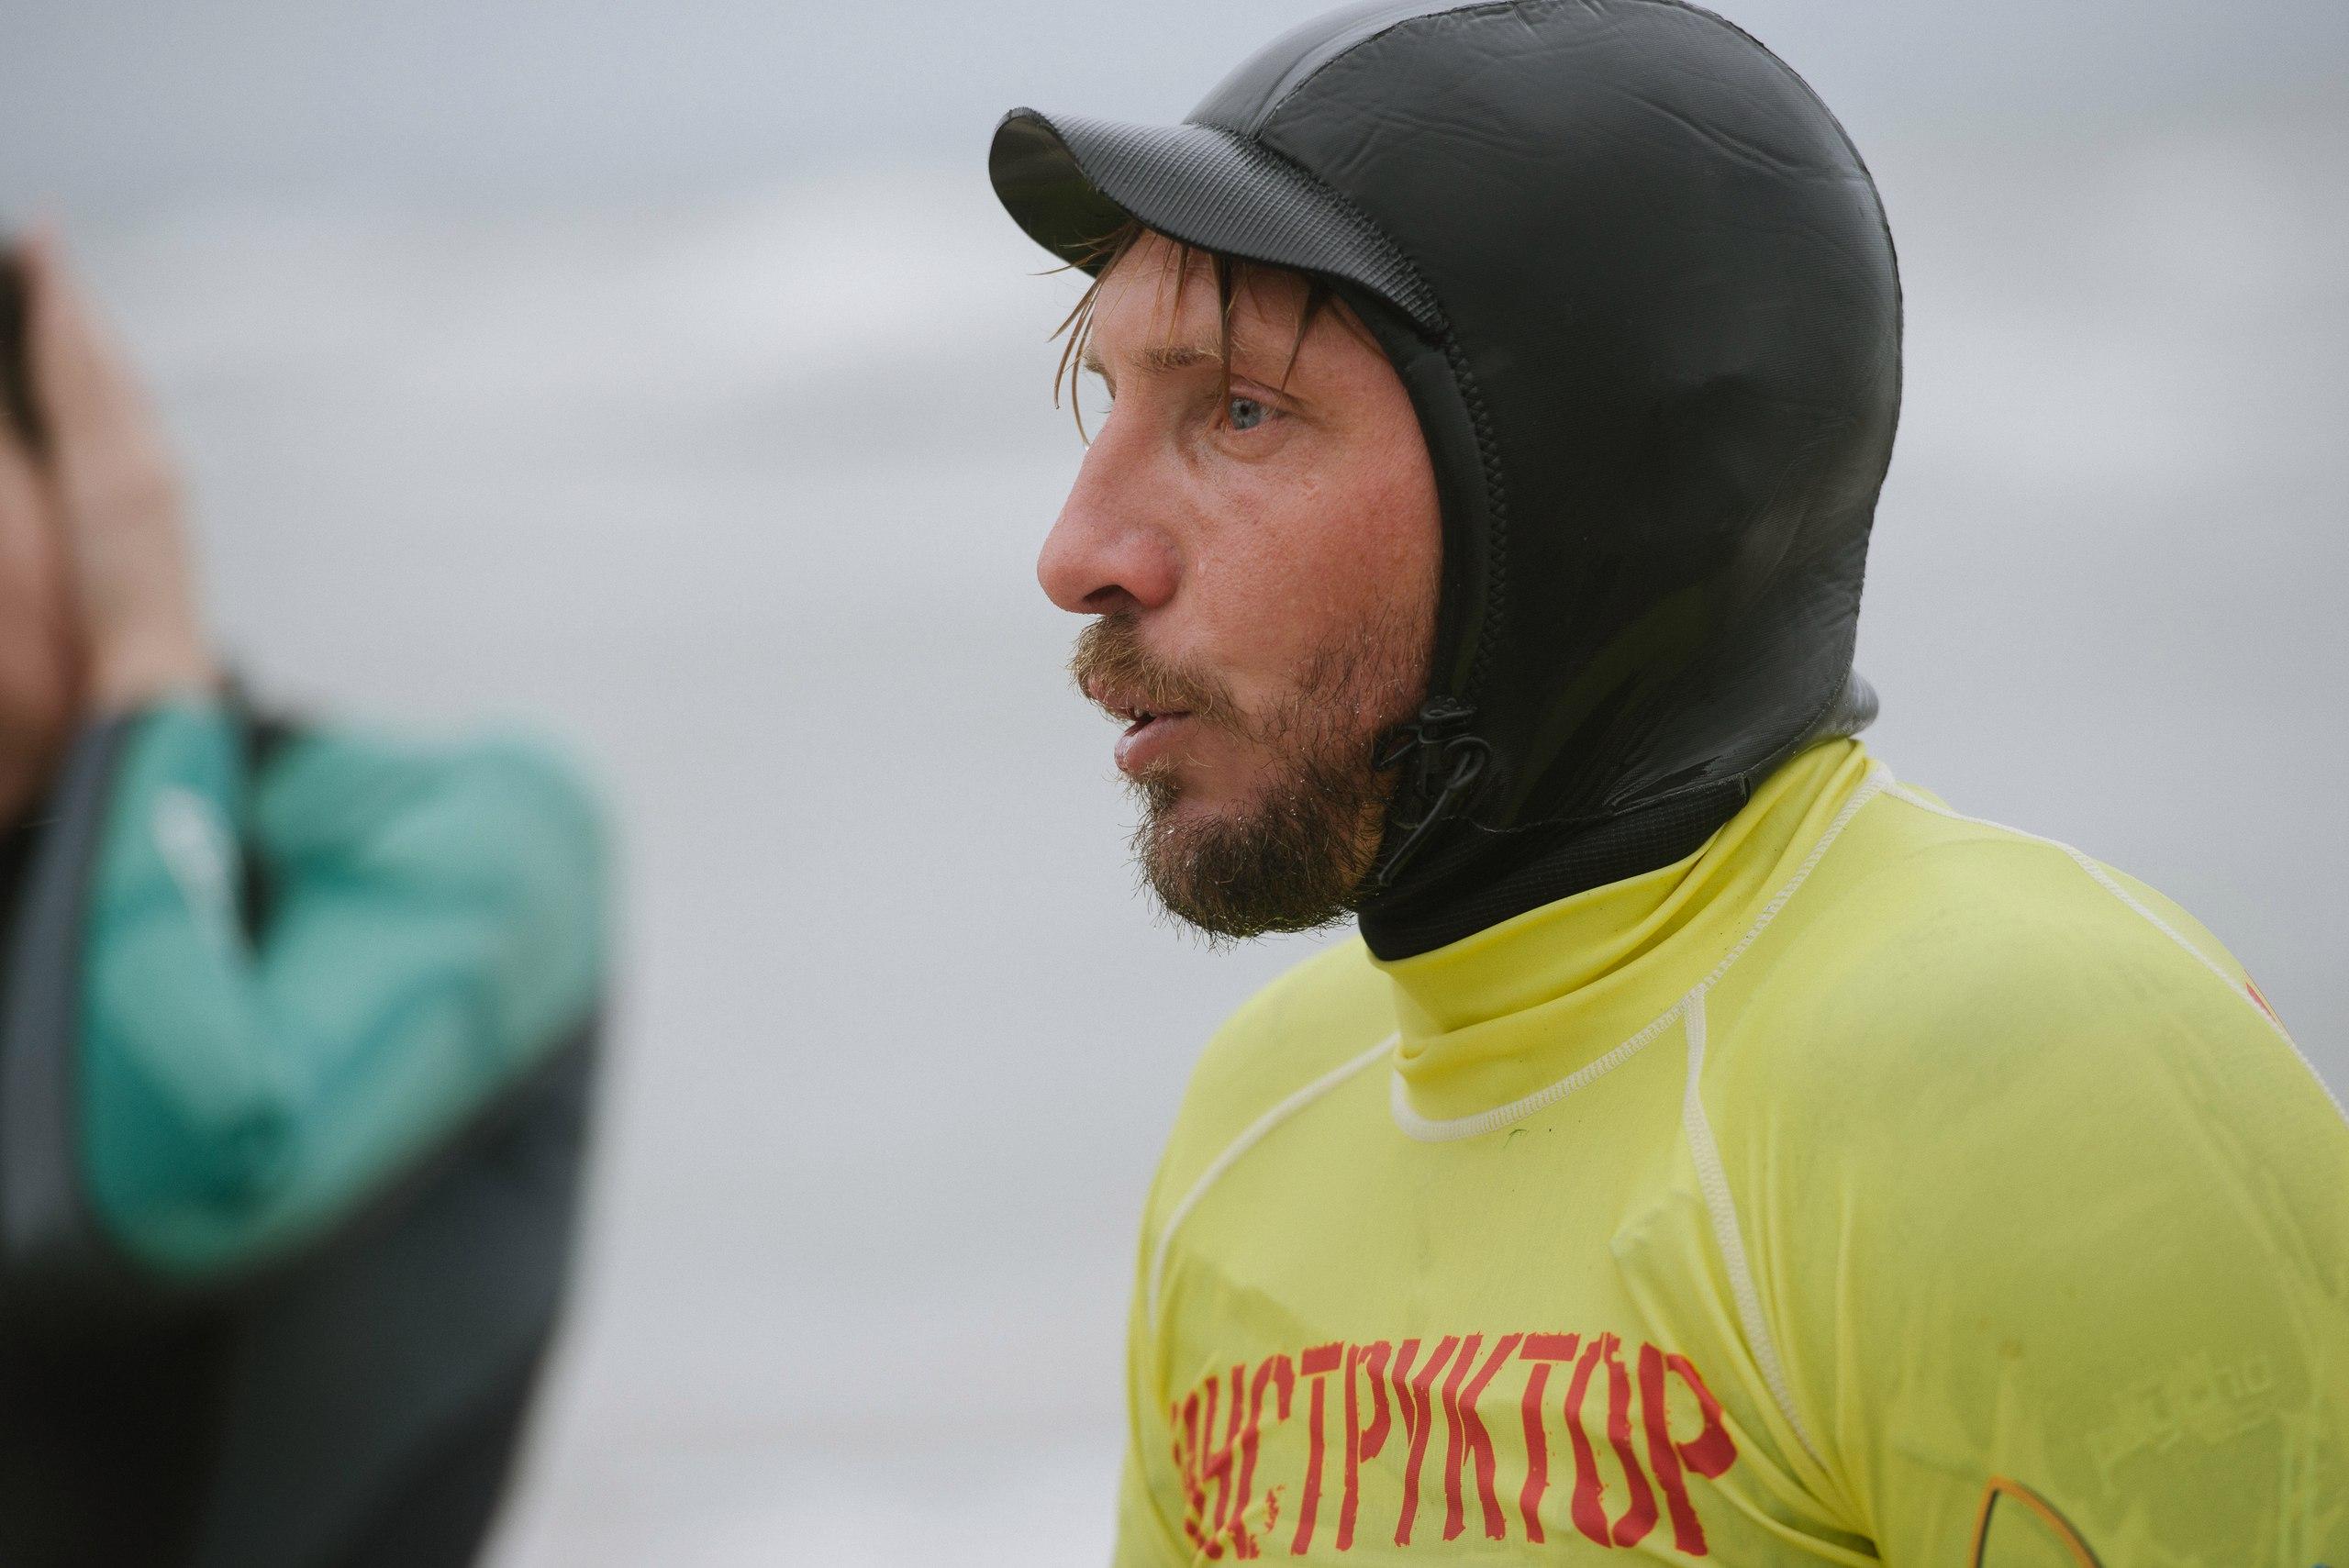 евгений исаков серфинг